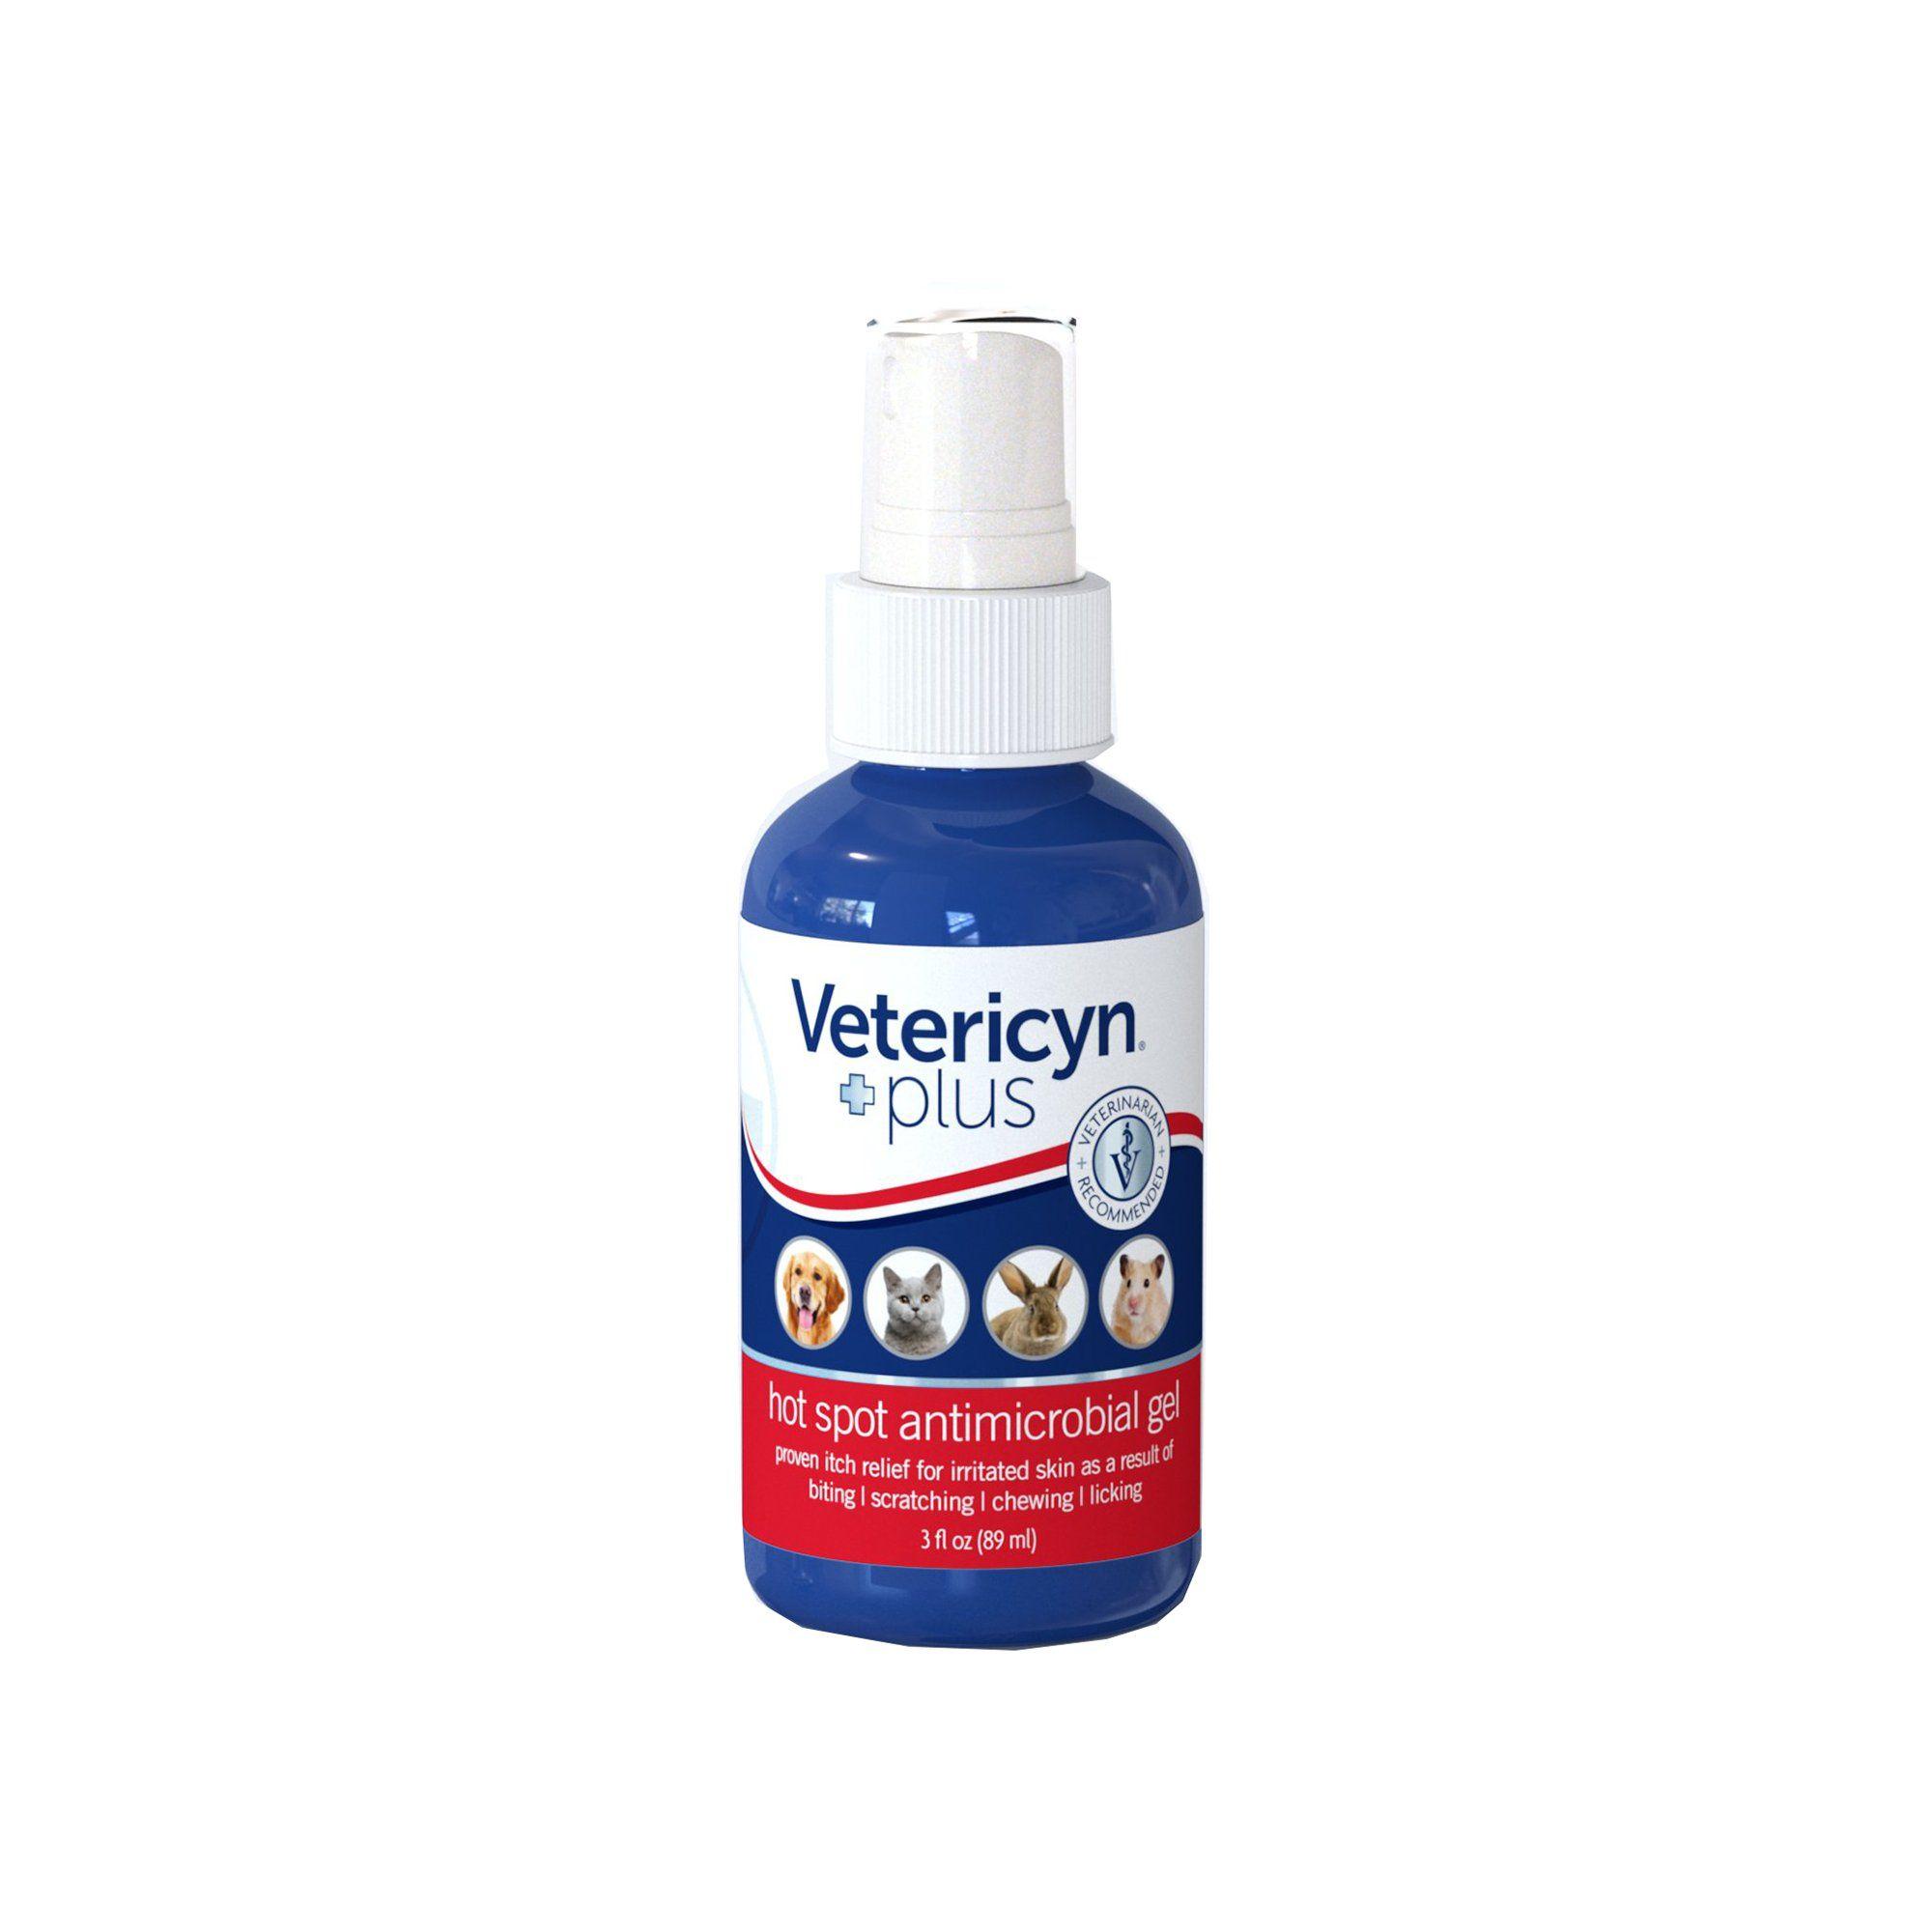 Vetericyn Plus Hot Spot Antimicrobial Pet Hydrogel, 3 fl